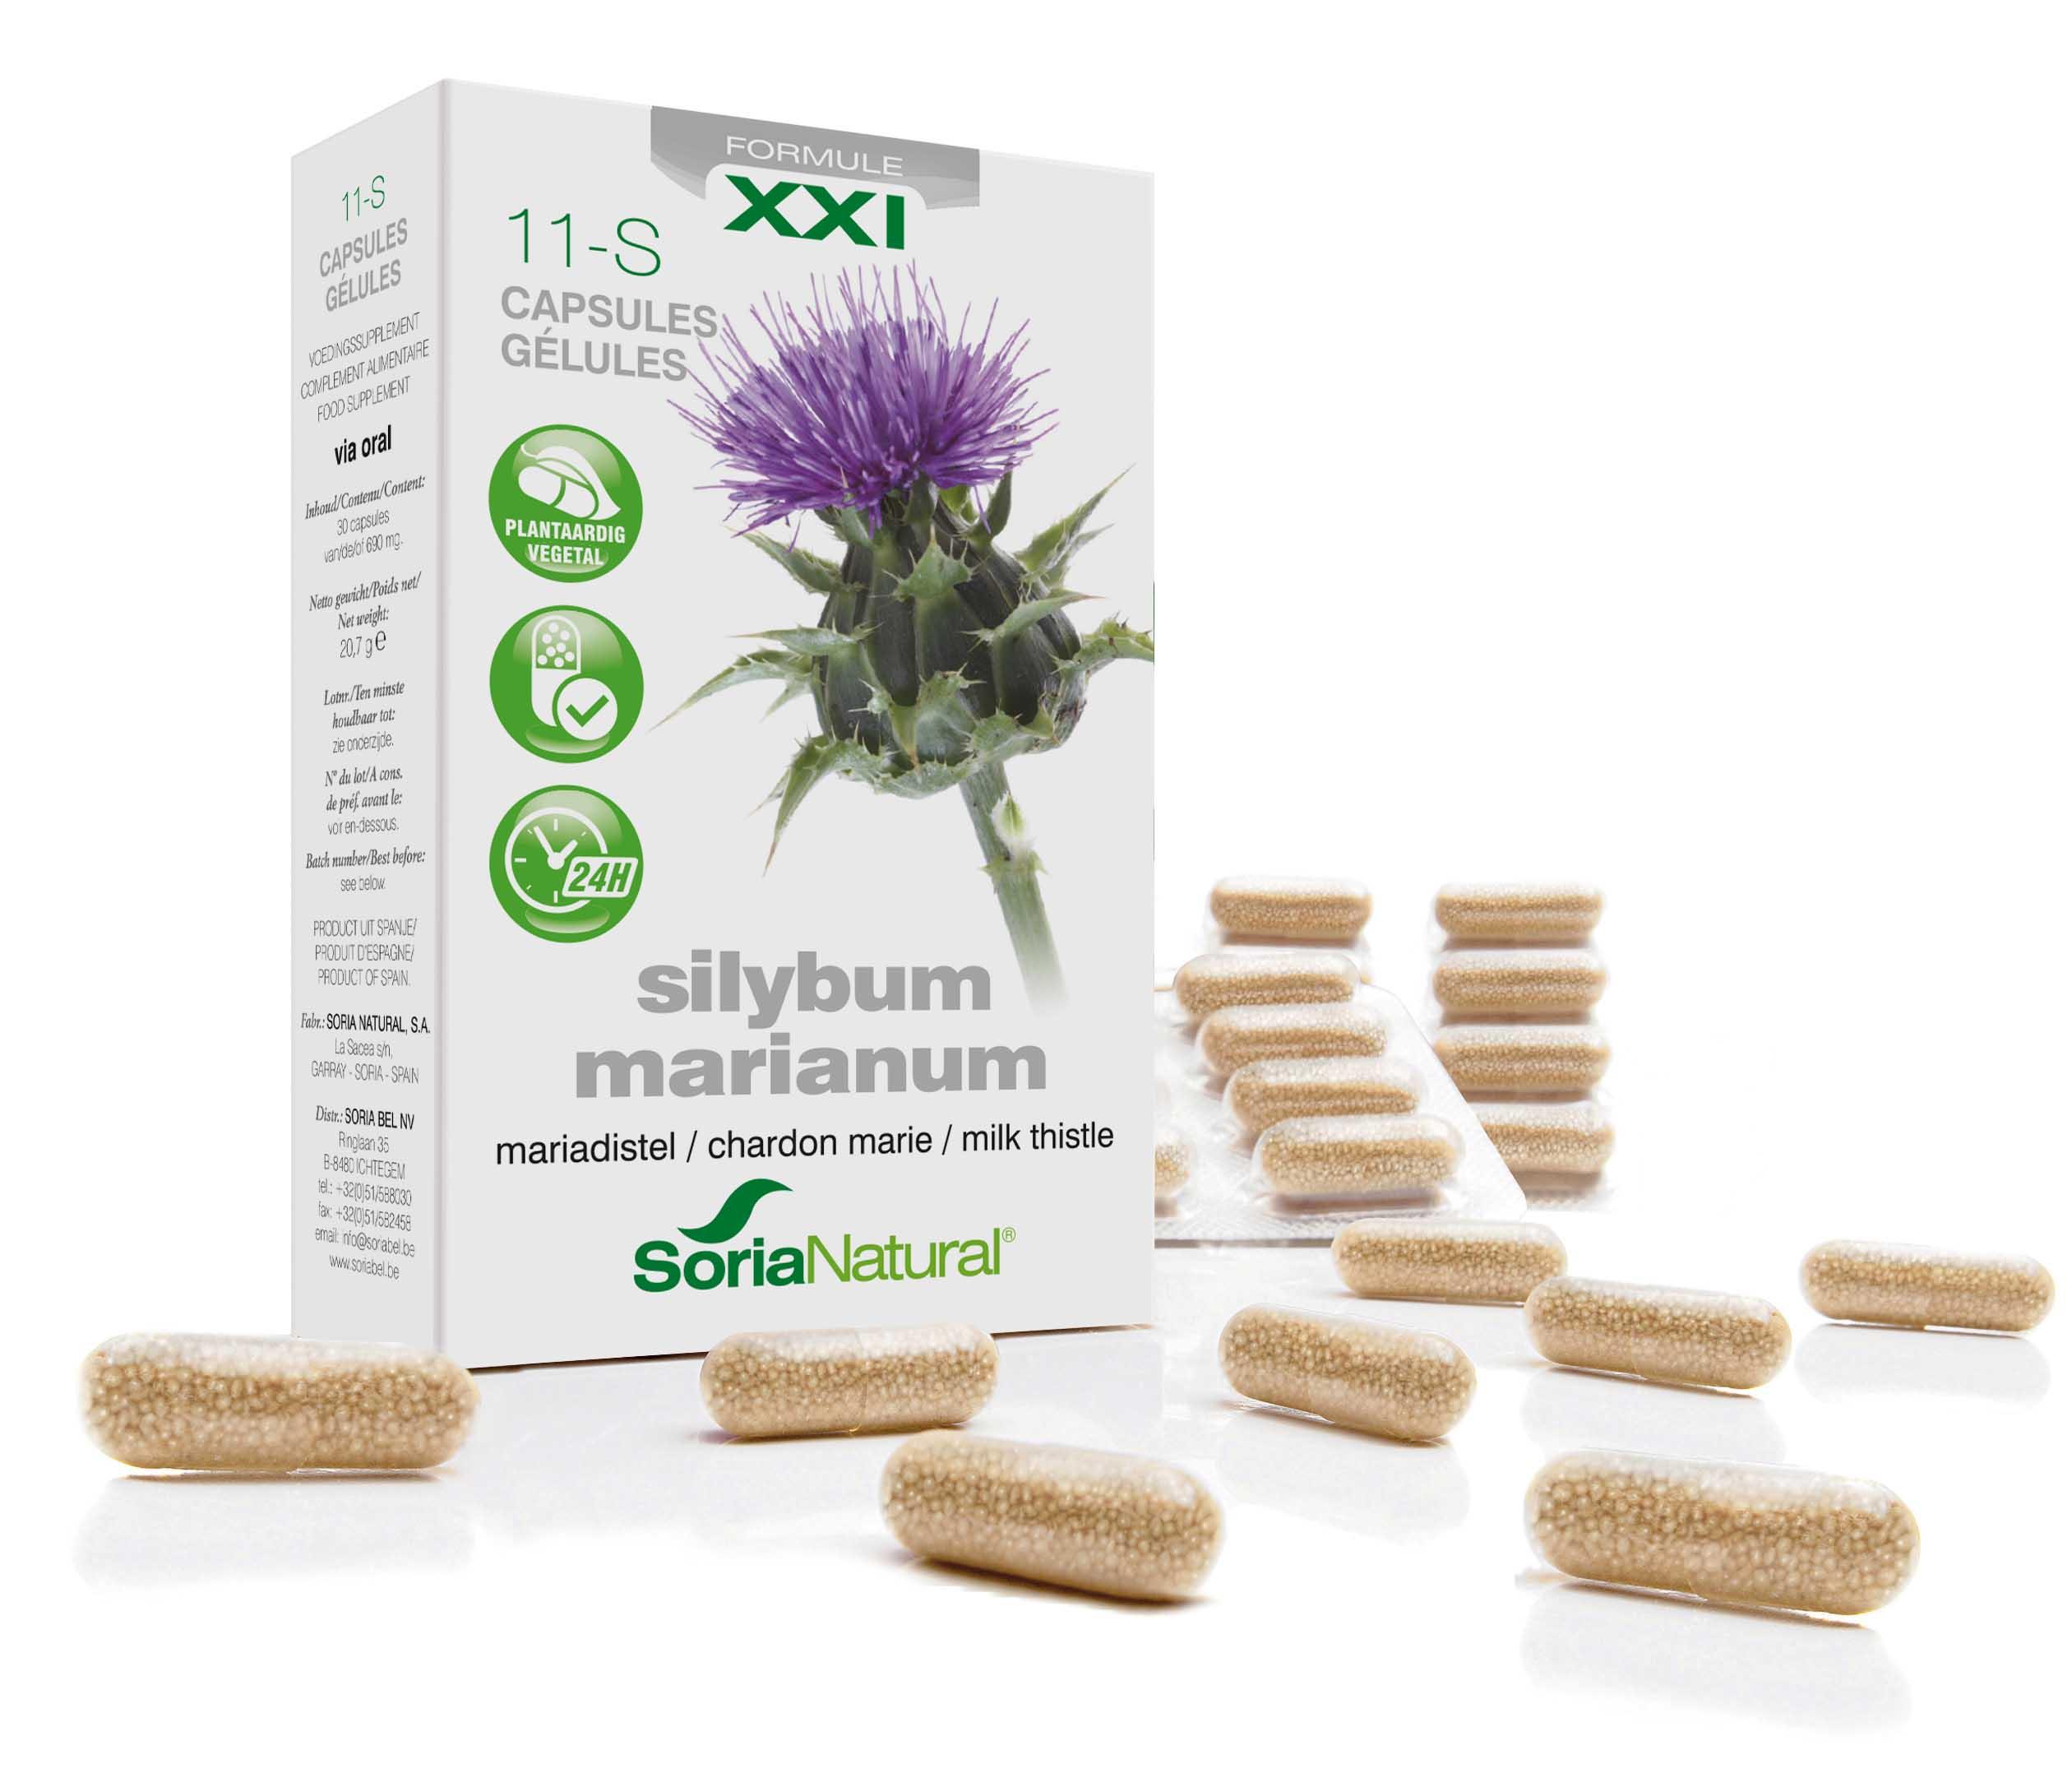 11-S Silybum marianum XXI: mariadistel 300 mg